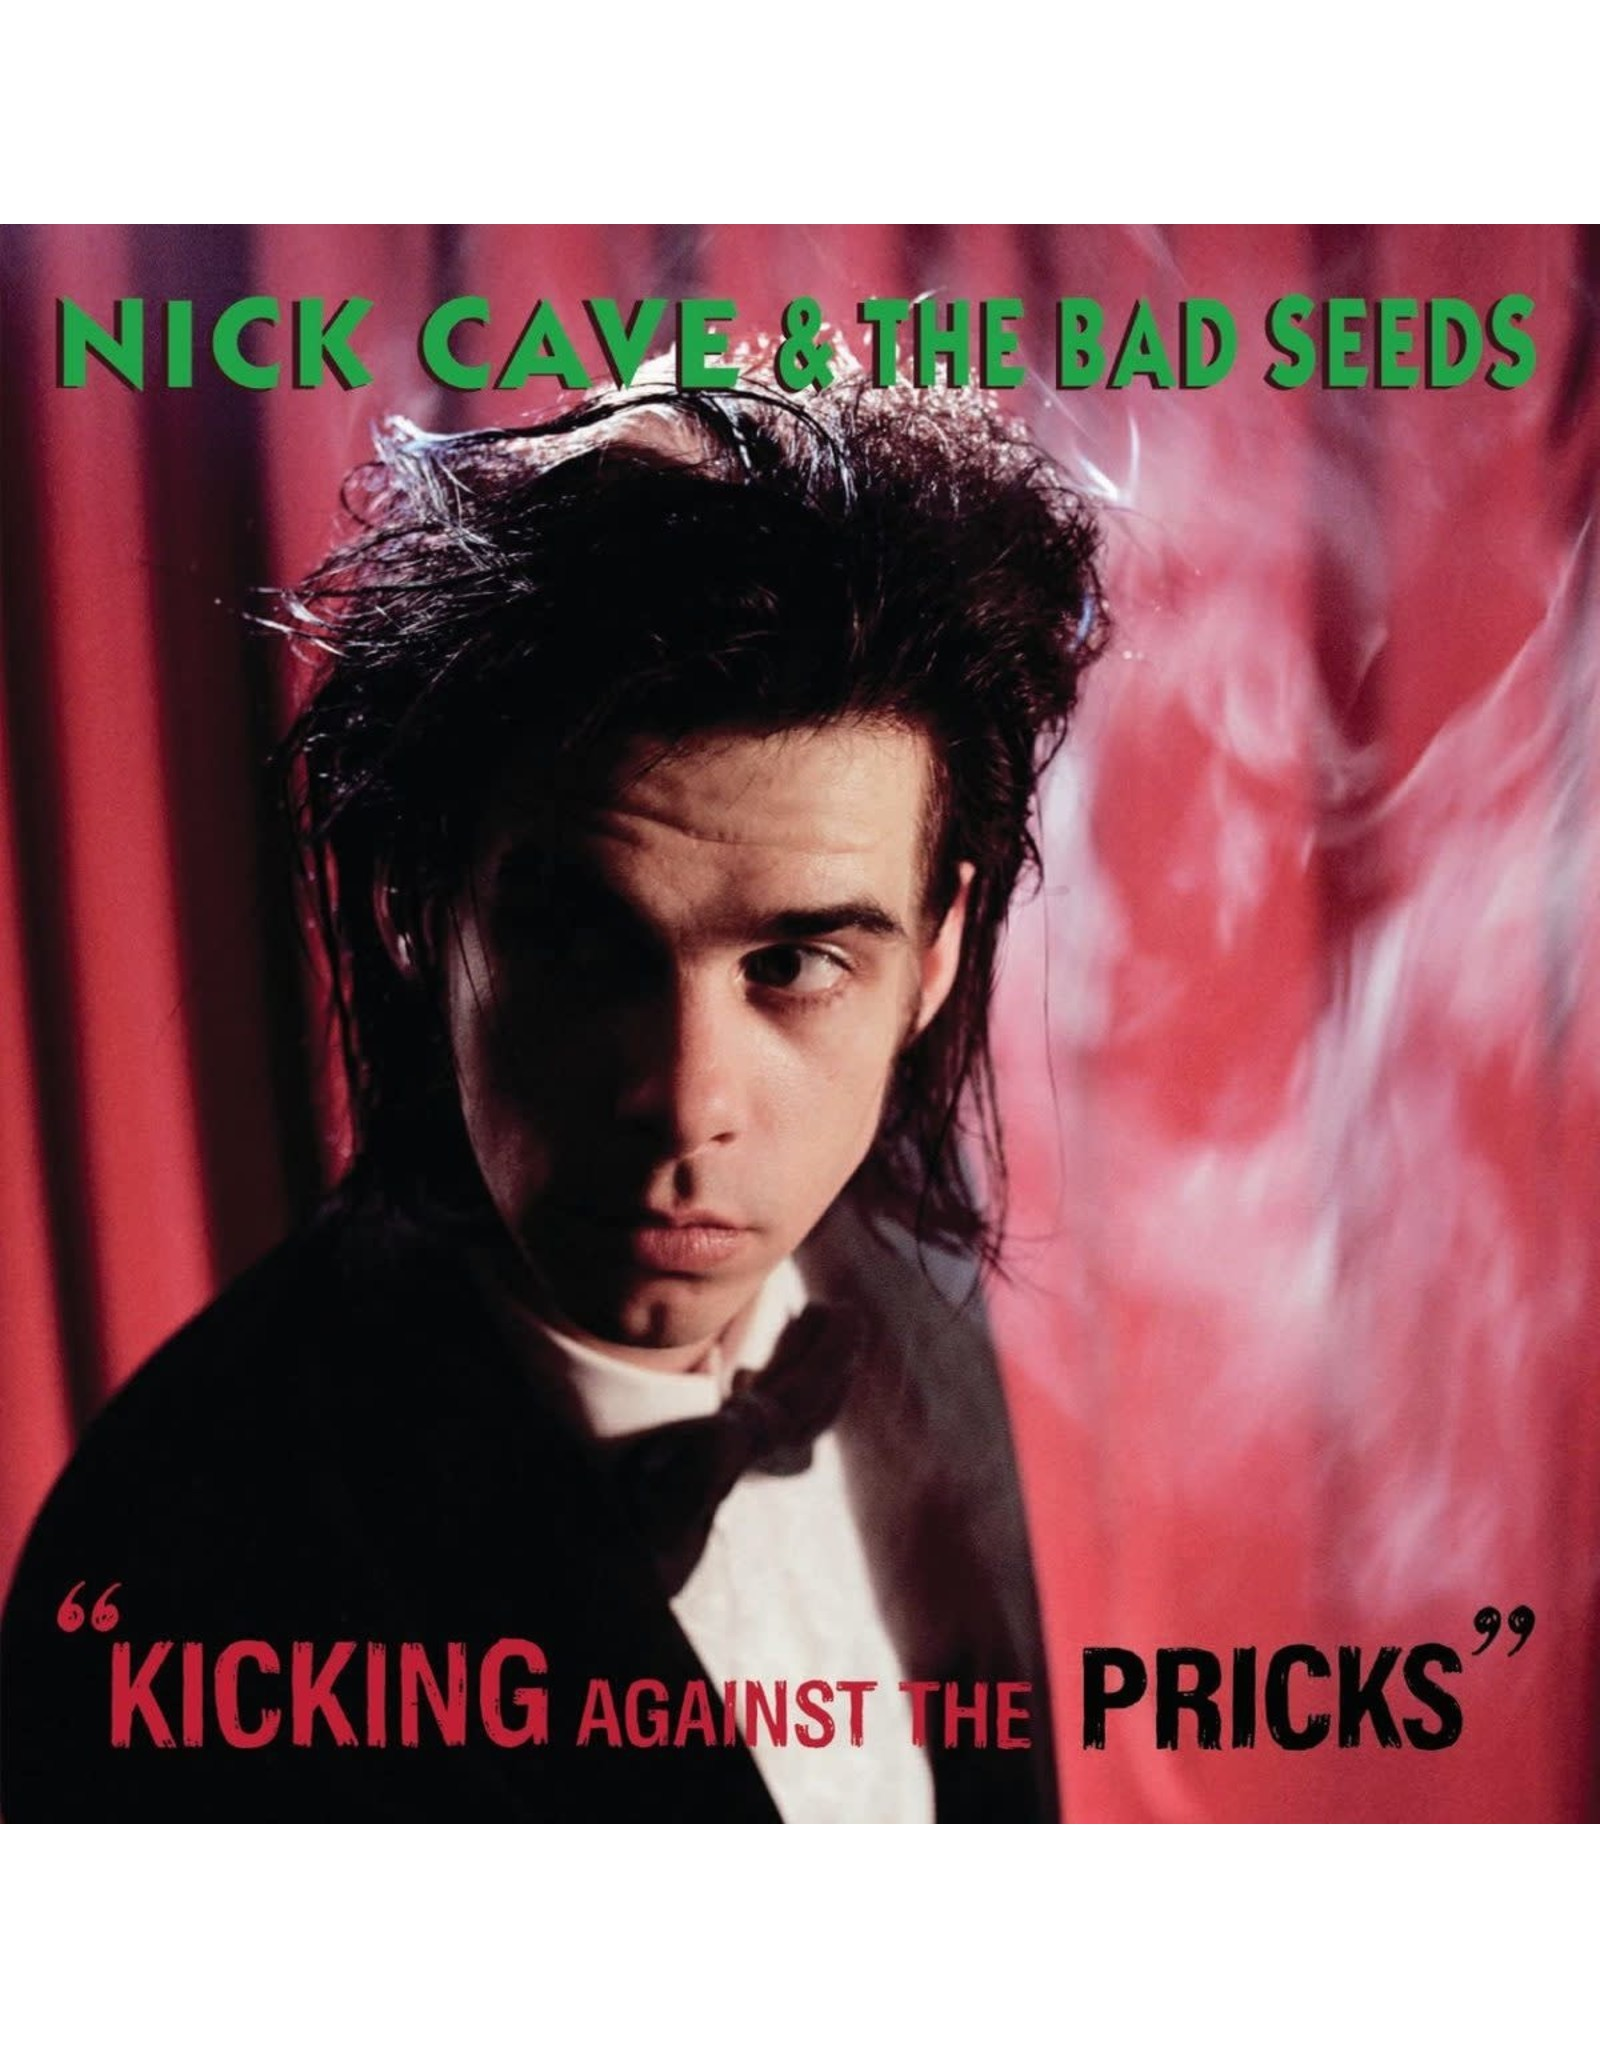 Cave, Nick - Kicking Against the Pricks LP